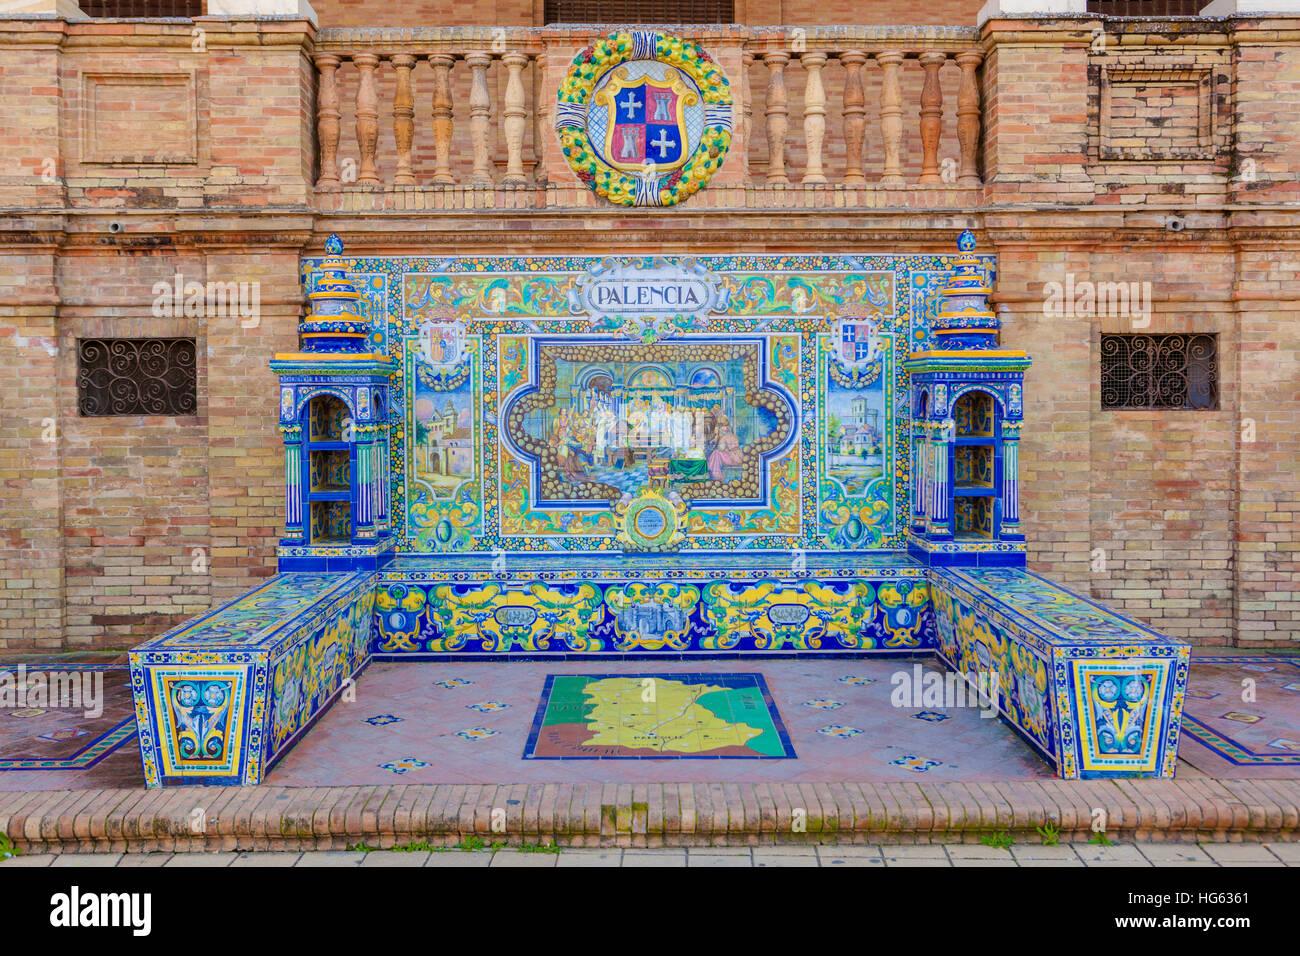 Glazed tiles bench of spanish province of Palencia at Plaza de Espana, Seville, Spain - Stock Image